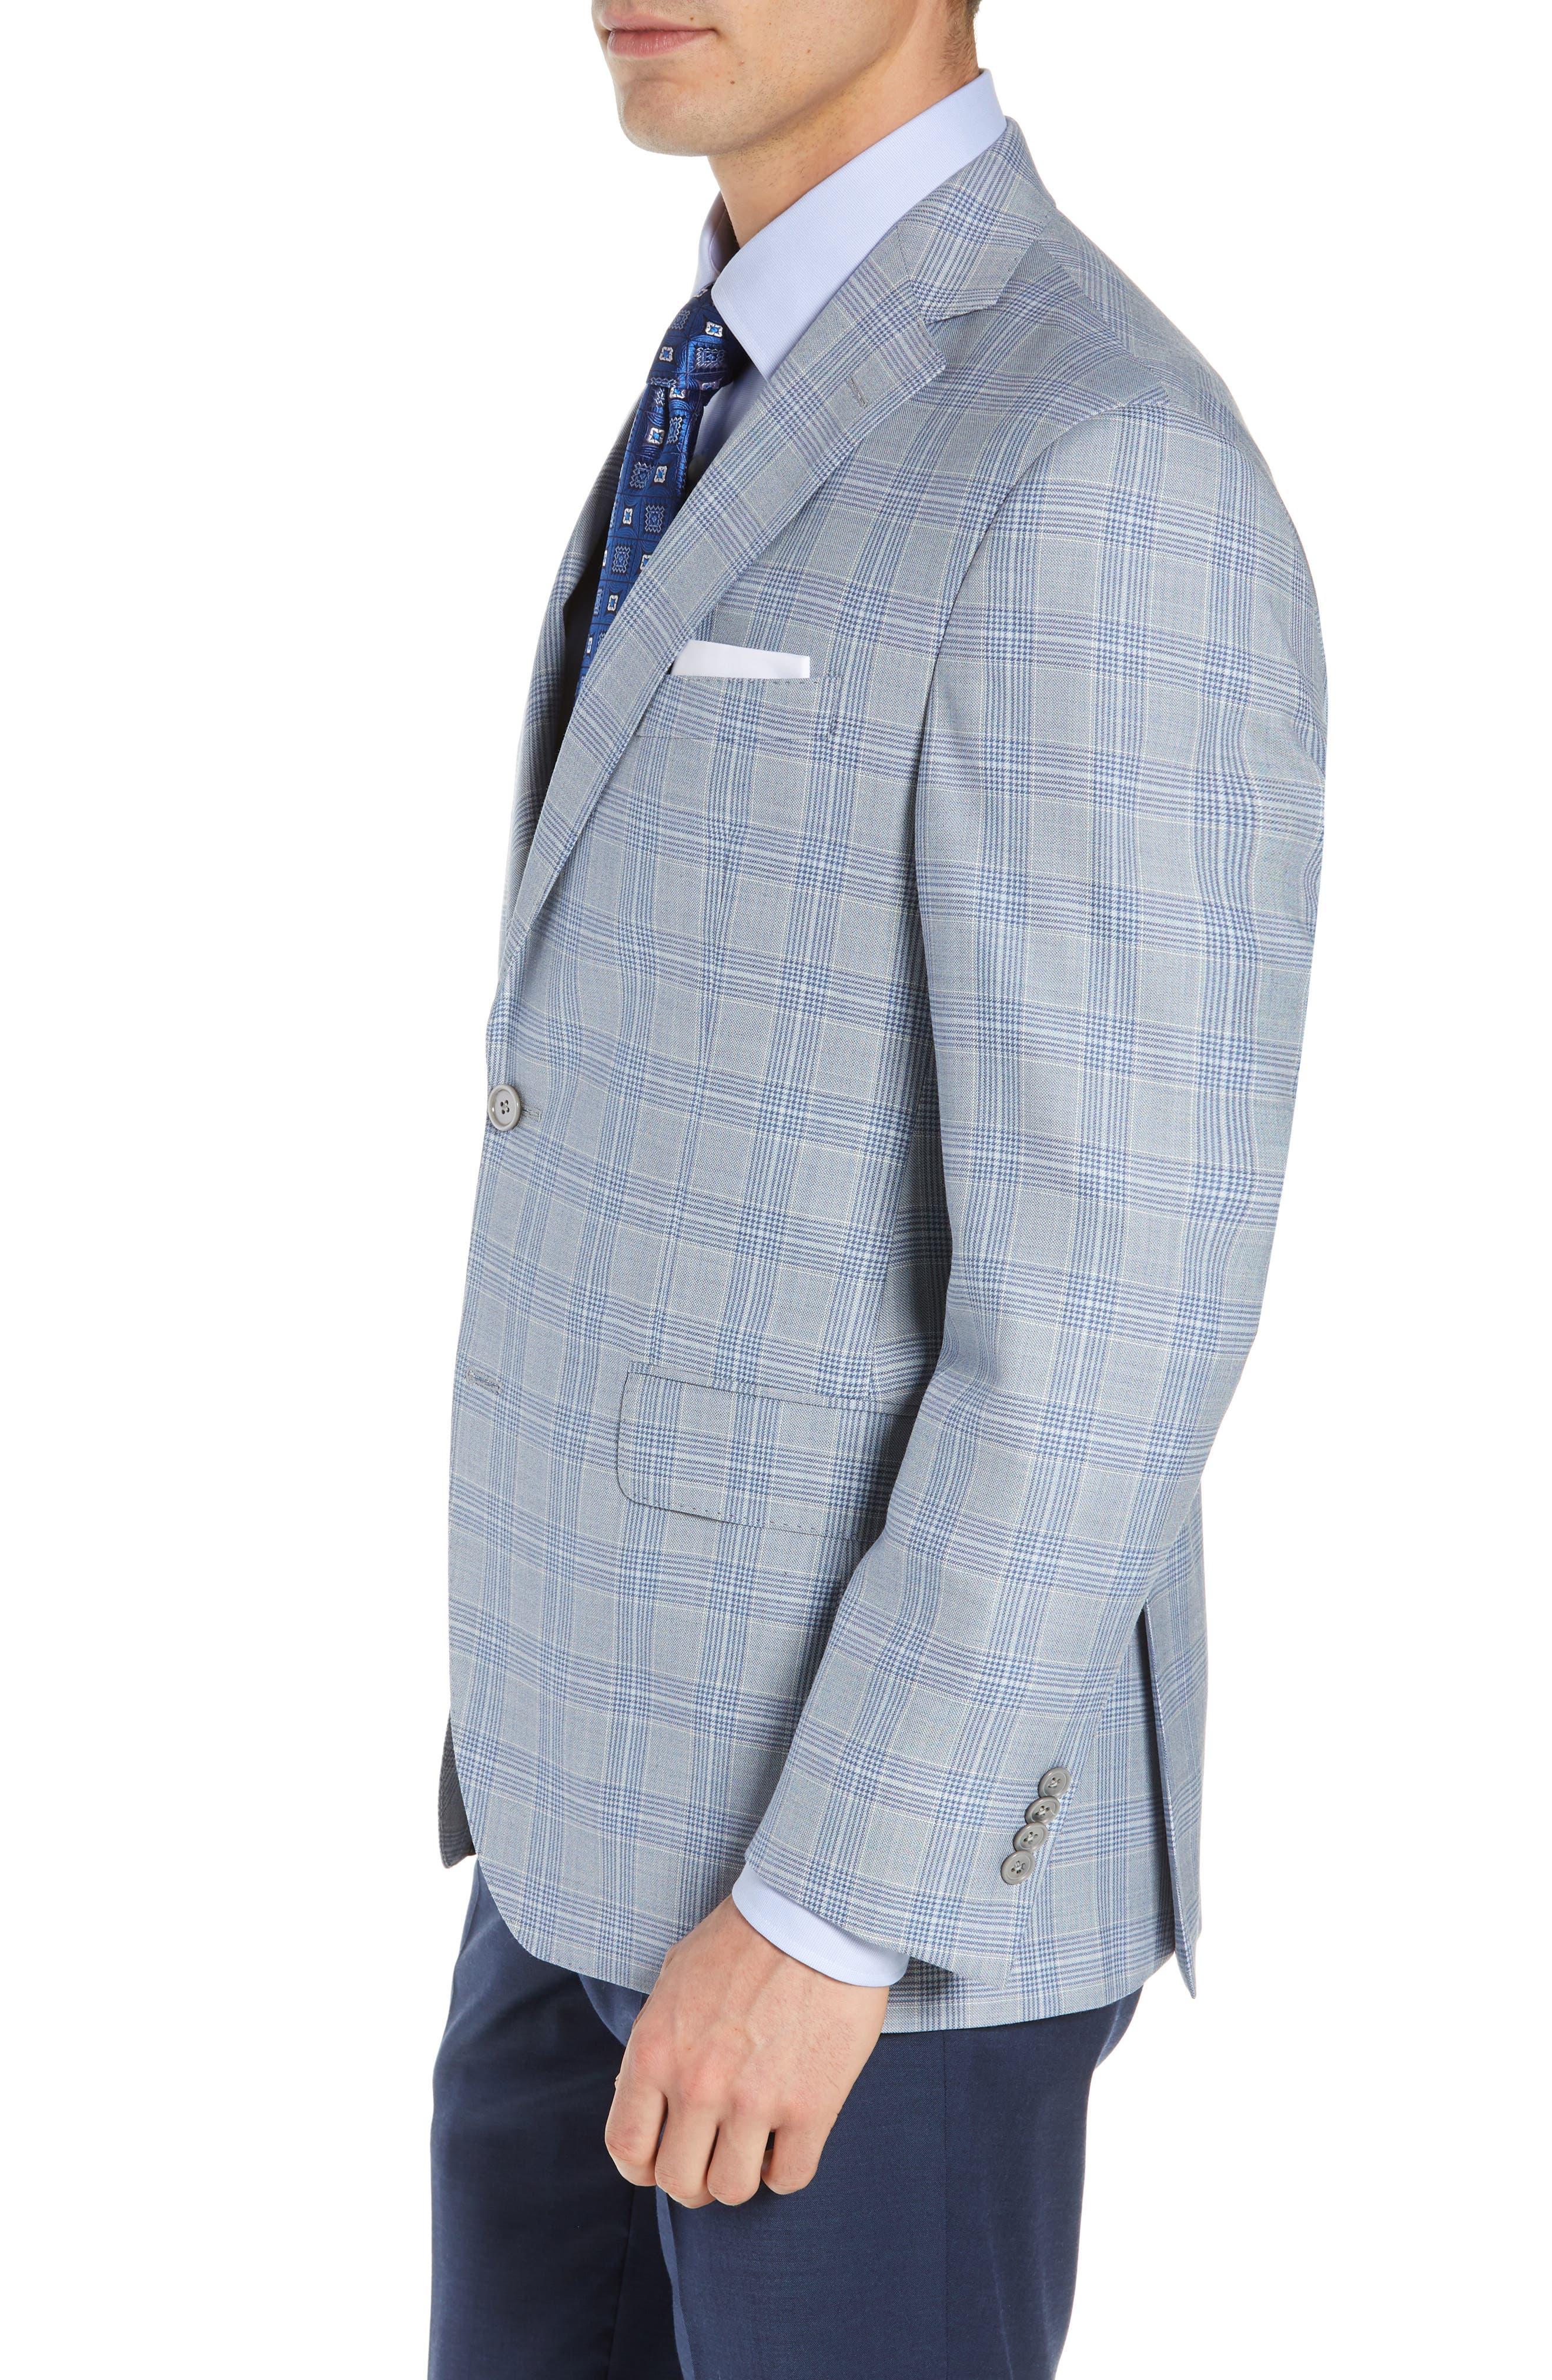 DAVID DONAHUE, Arnold Classic Fit Plaid Wool Sport Coat, Alternate thumbnail 3, color, BLUE